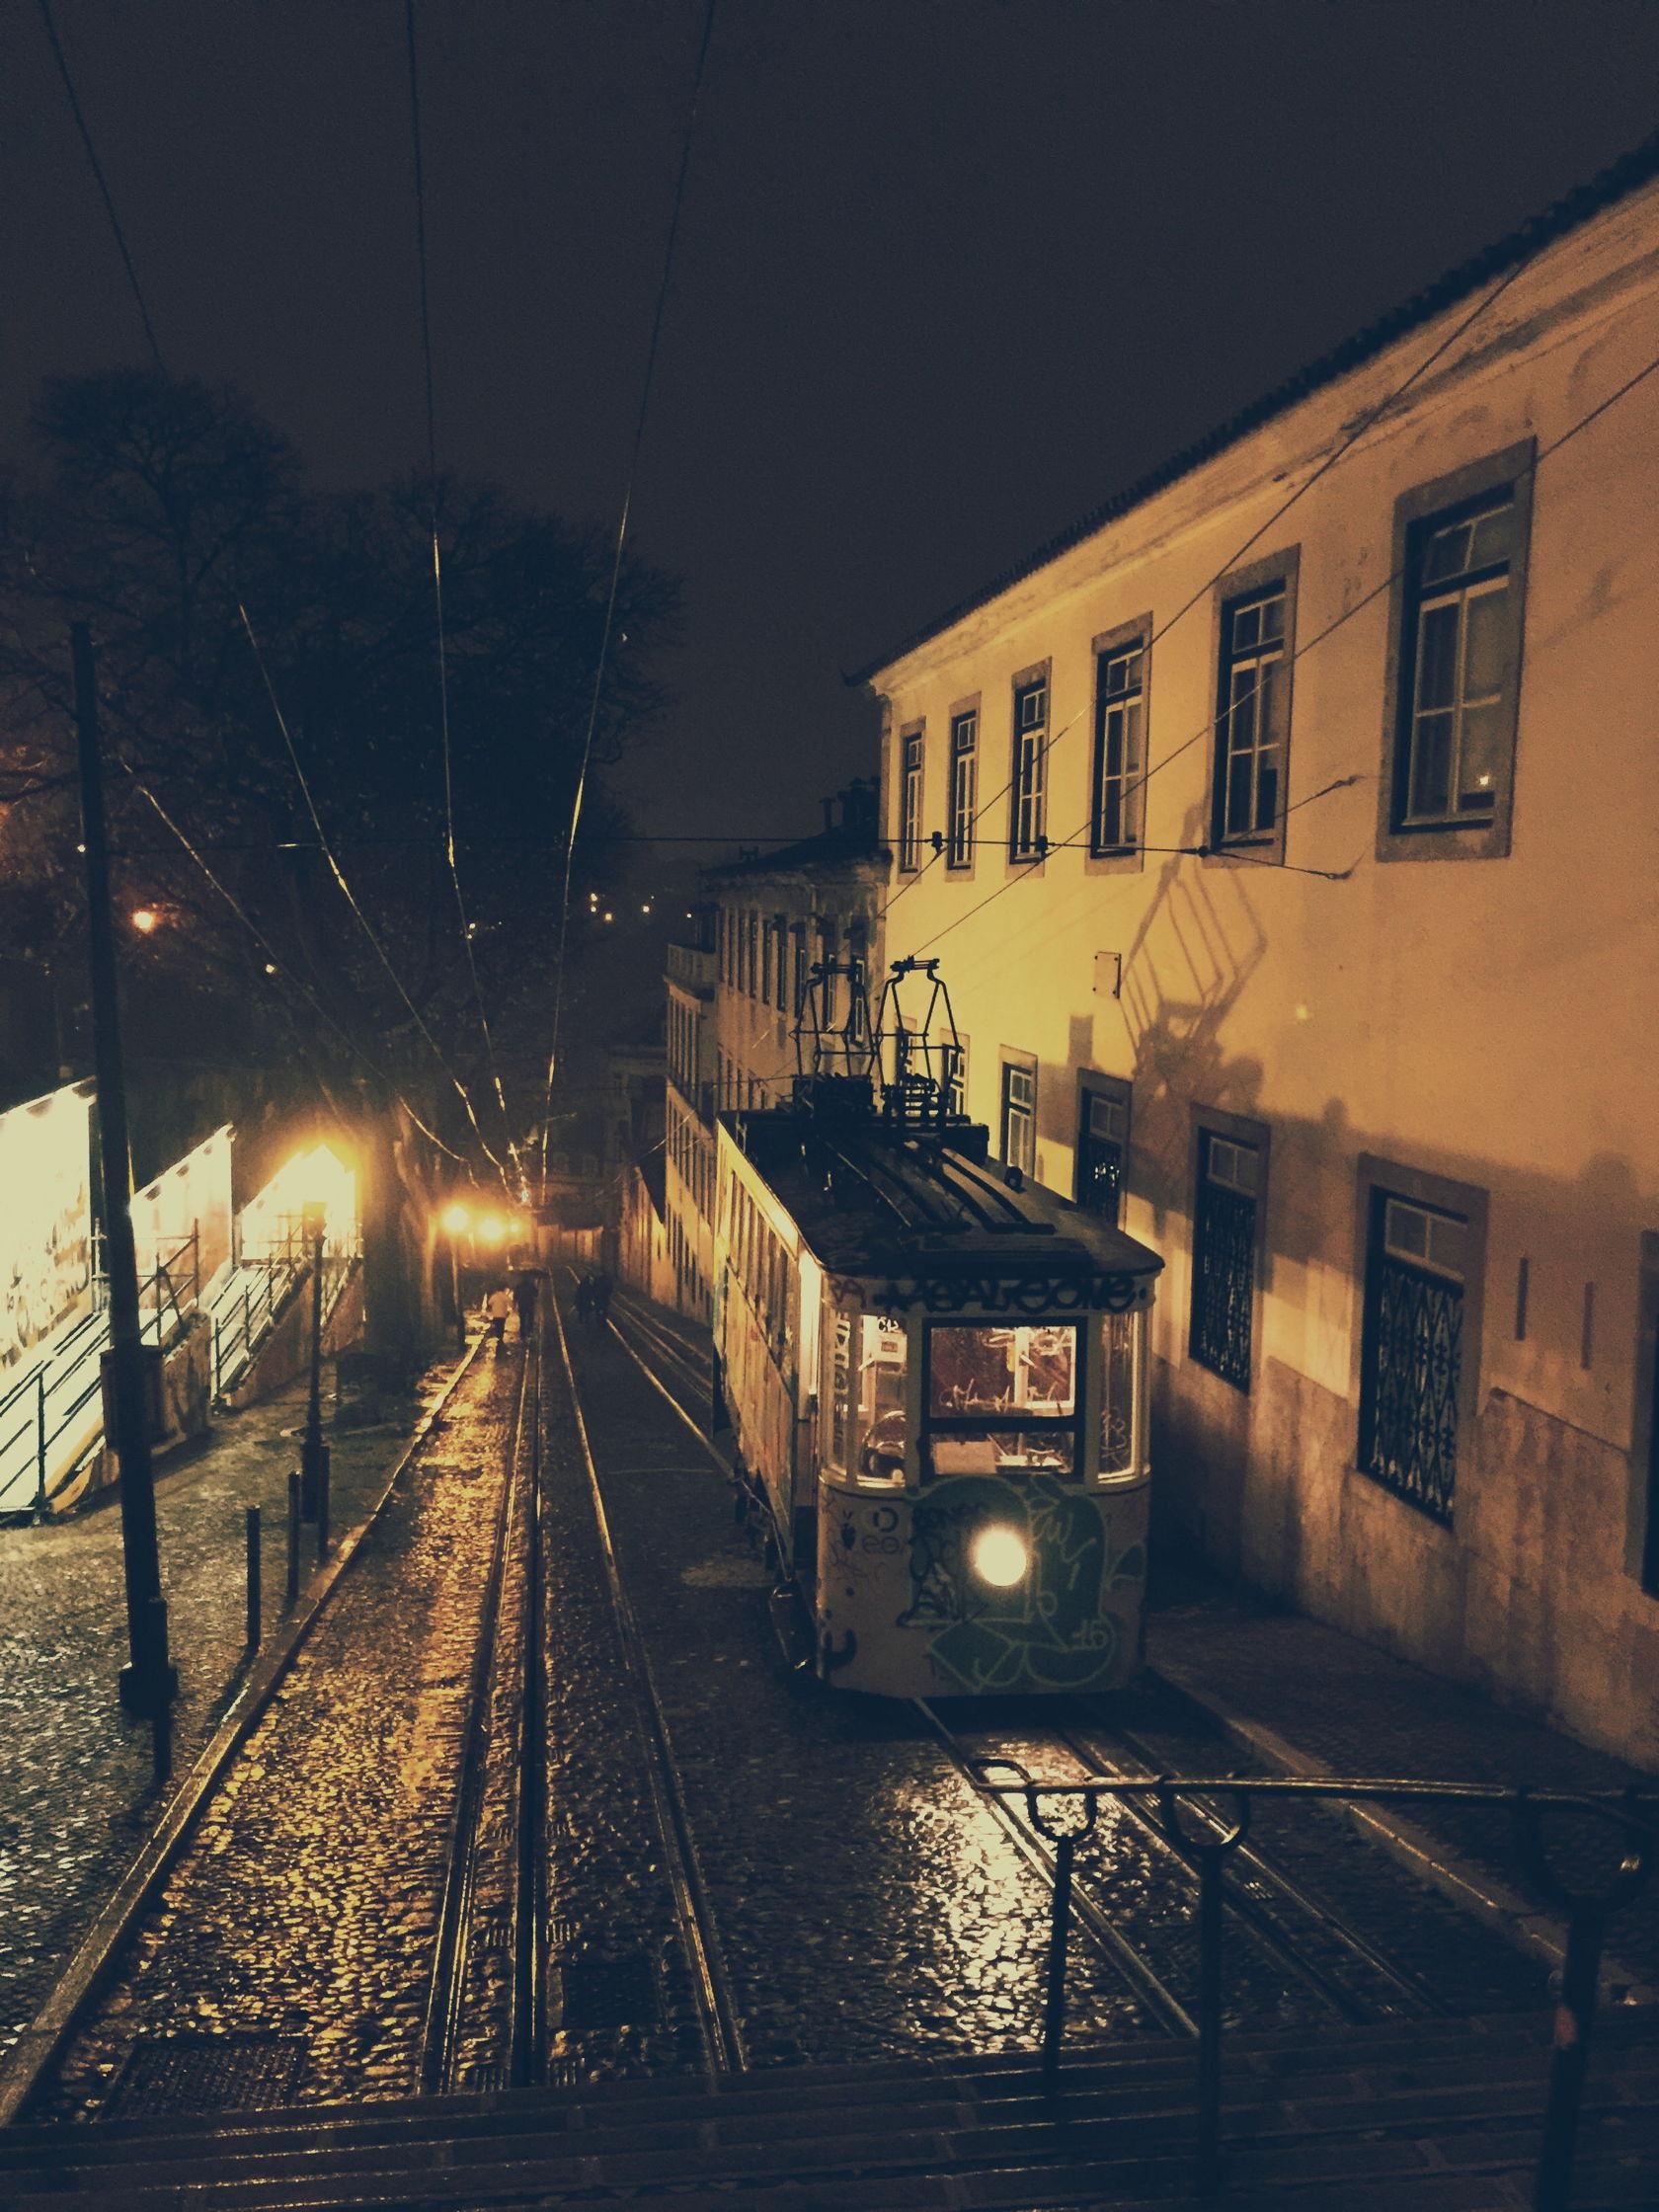 lisbon, night, лиссабон, ночь, вечерний лиссабон, ночной лиссабон